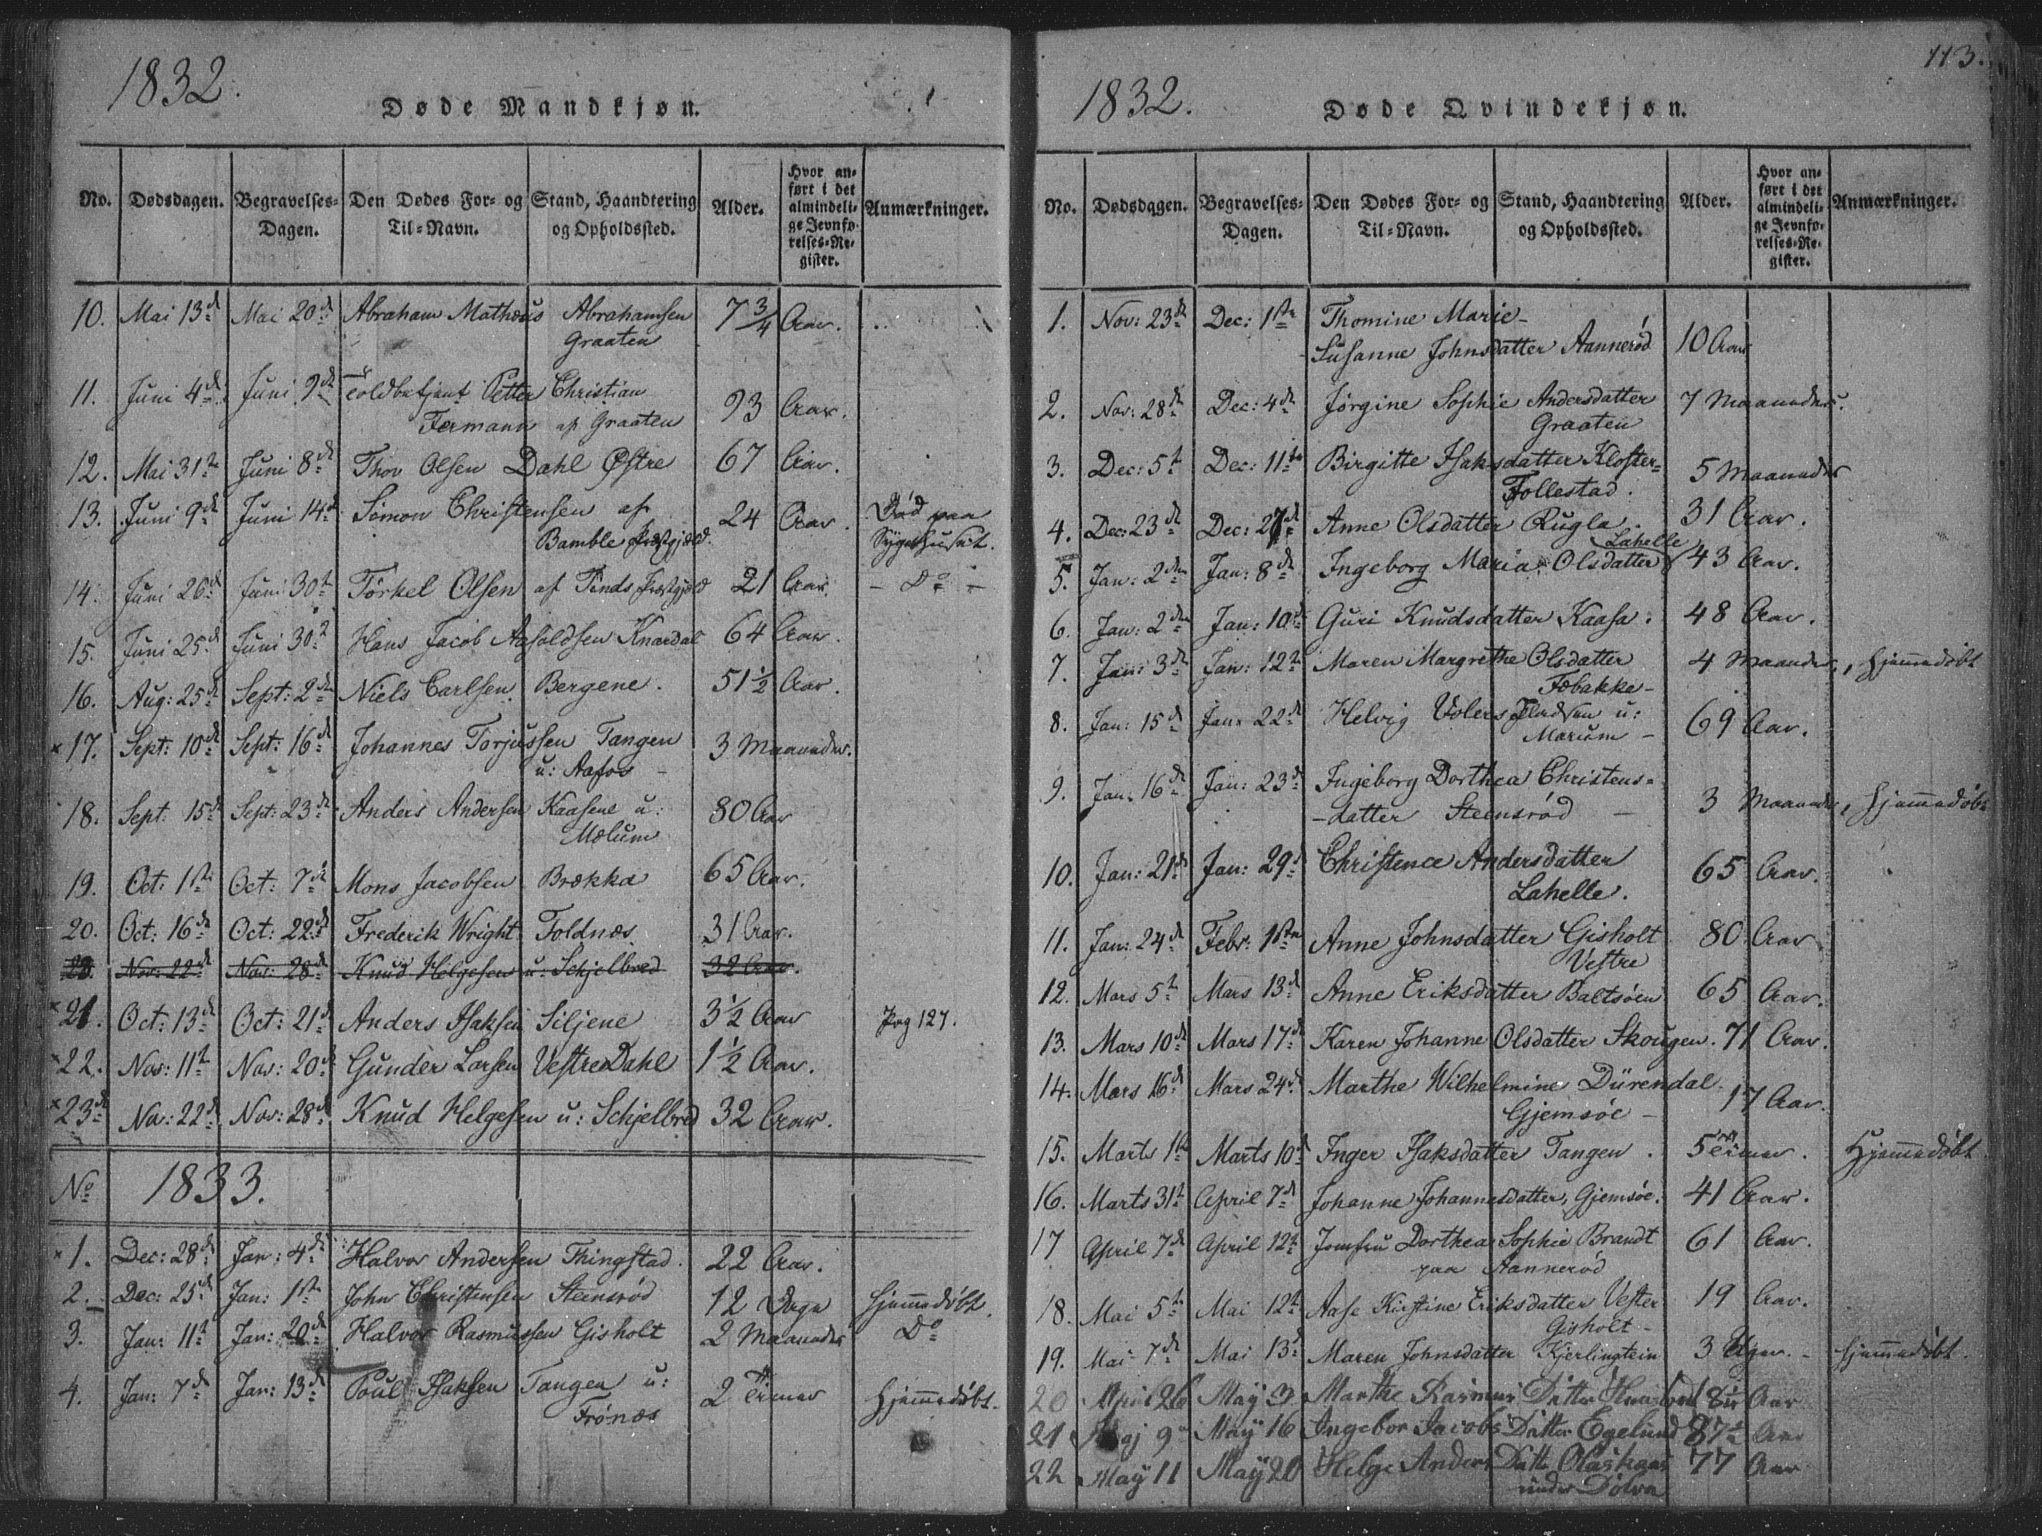 SAKO, Solum kirkebøker, F/Fa/L0004: Ministerialbok nr. I 4, 1814-1833, s. 113